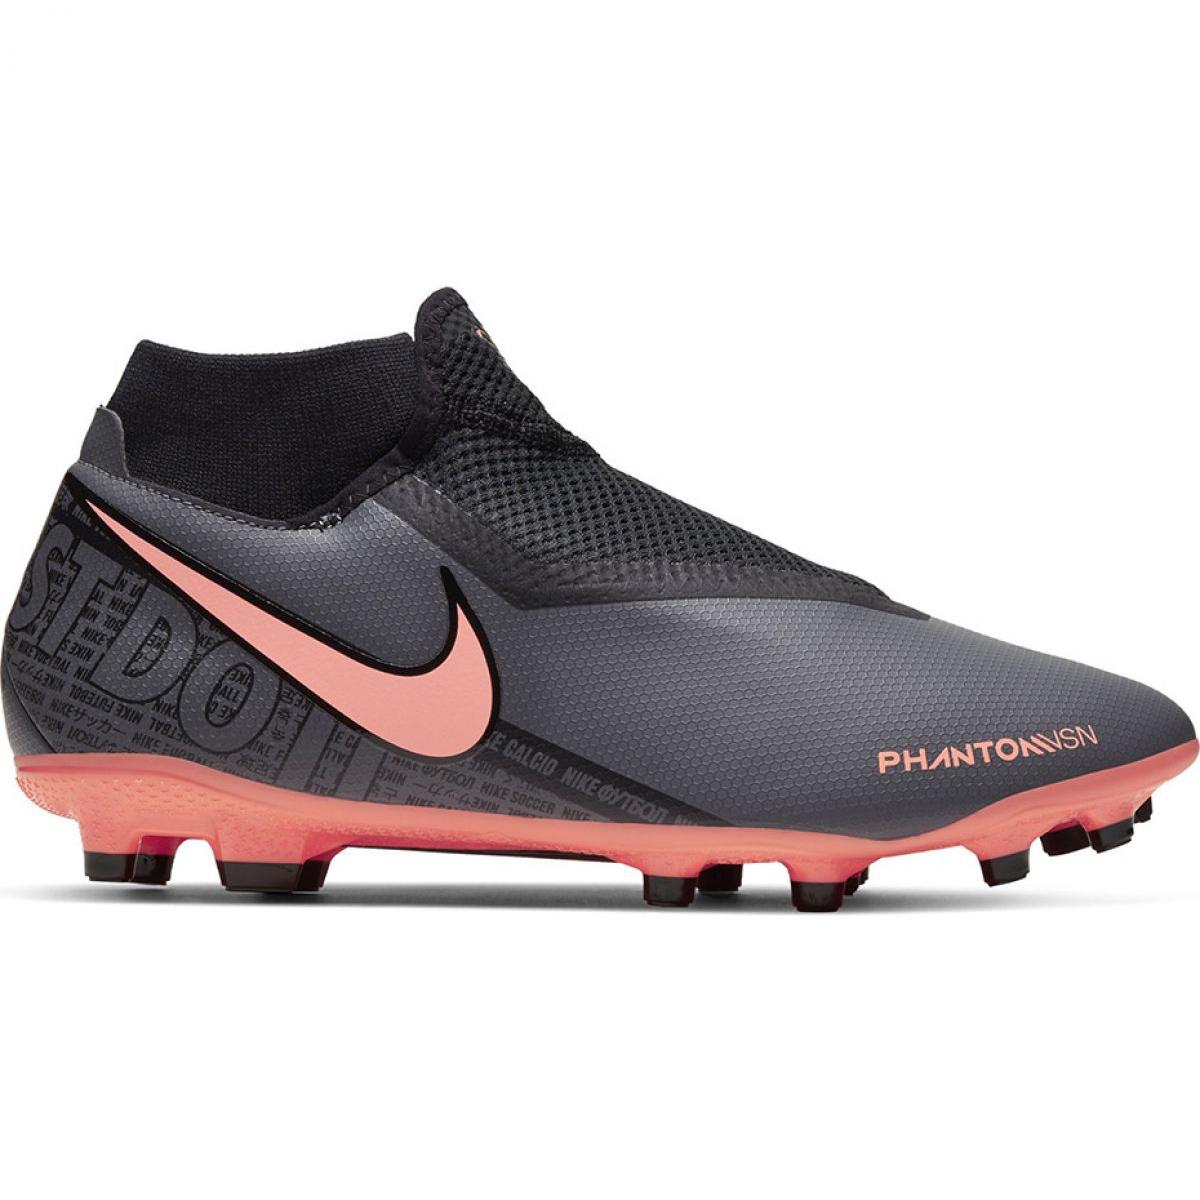 Nike Phantom Vision Elite DF FG Azul Preto Prateado